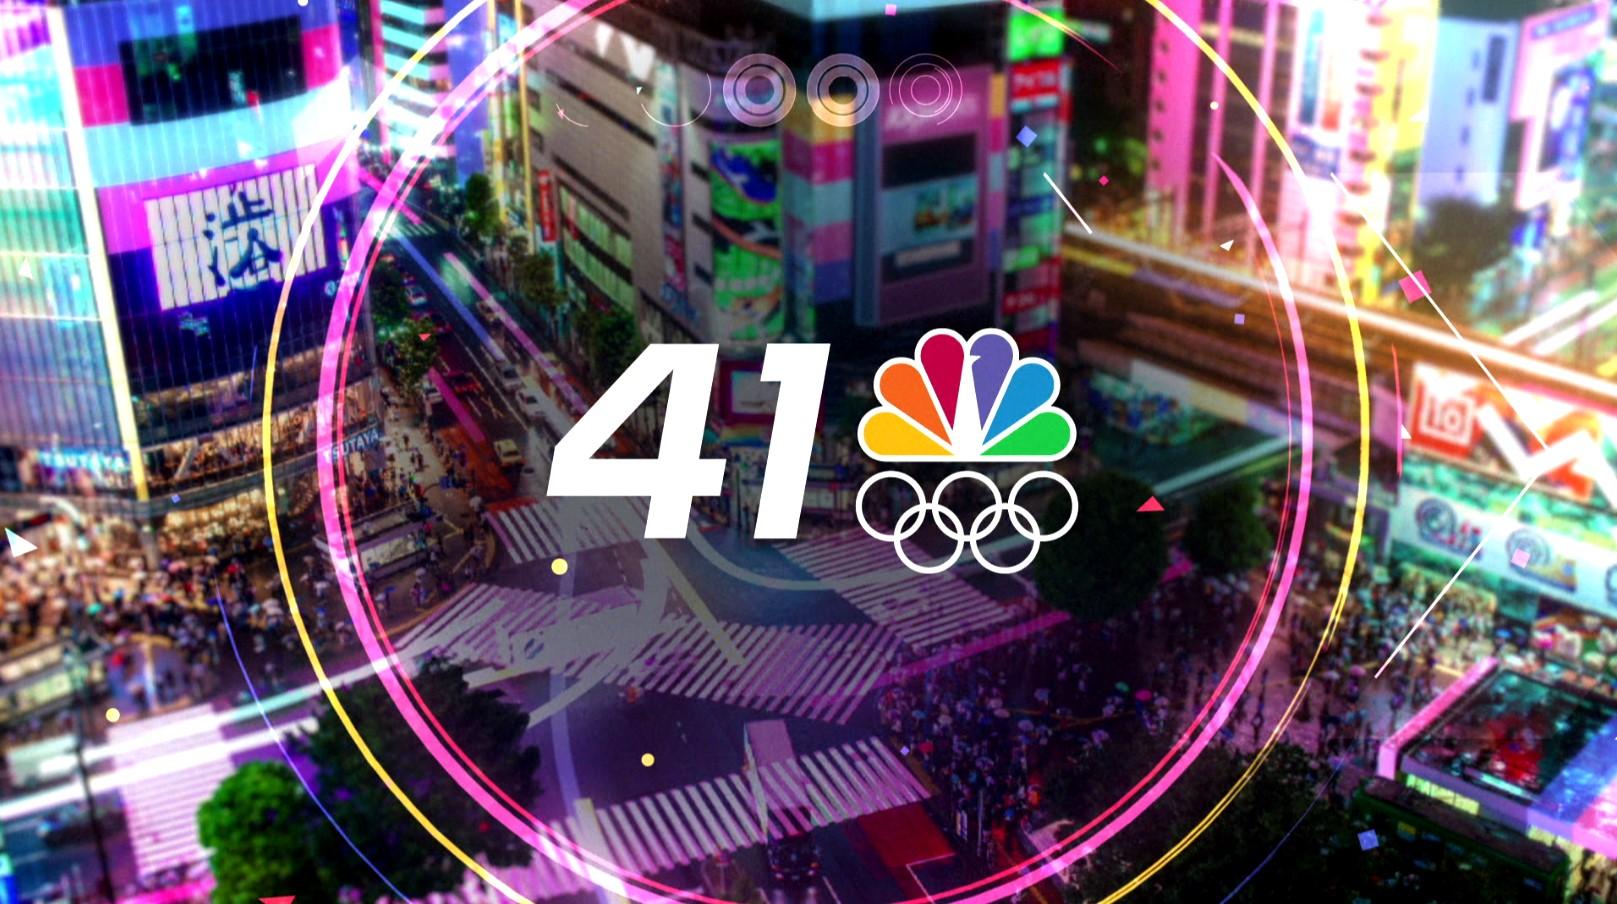 41nbc olympics.